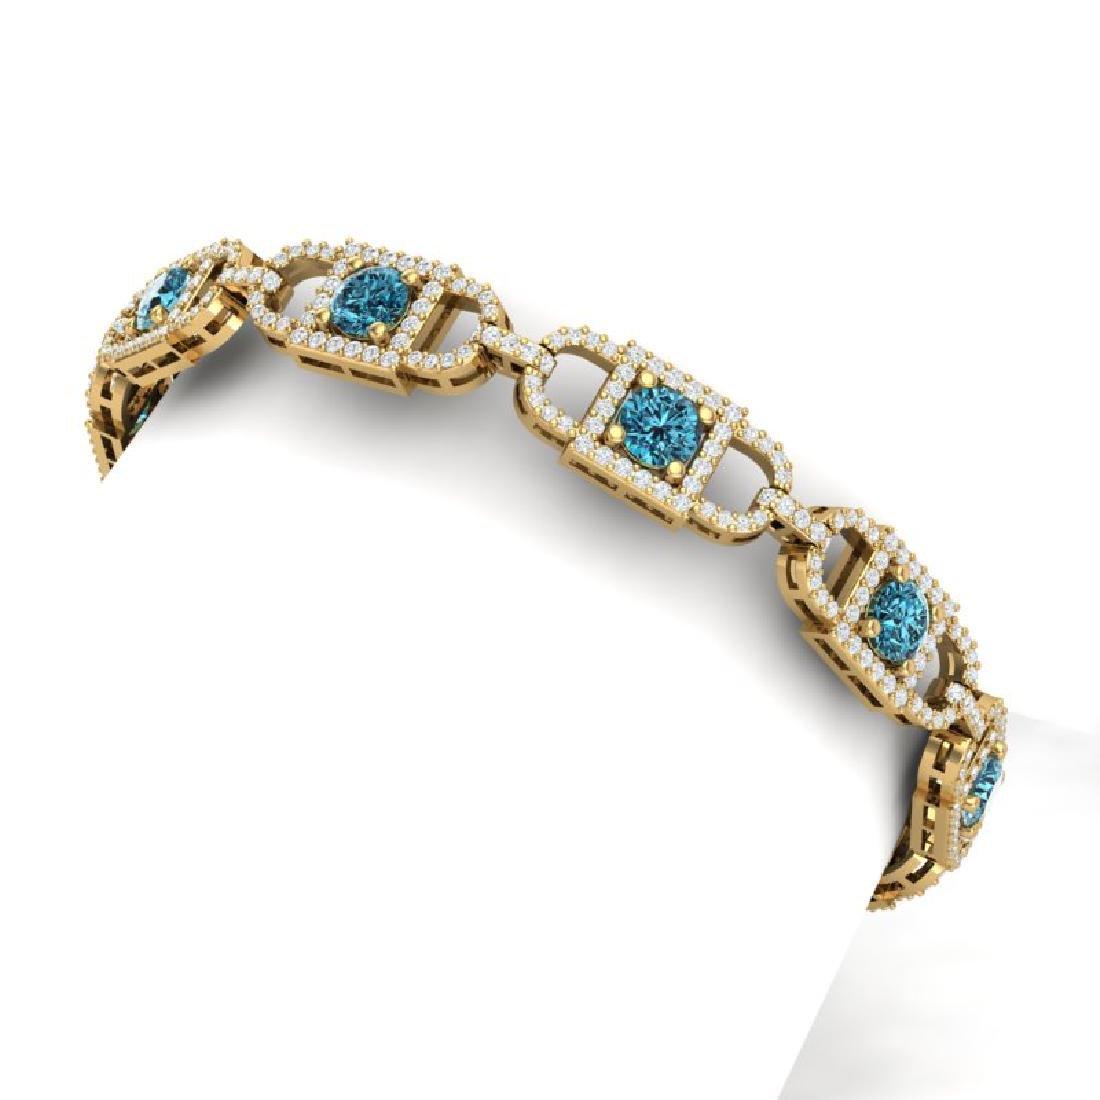 8 CTW SI/I Intense Blue And White Diamond Bracelet 18K